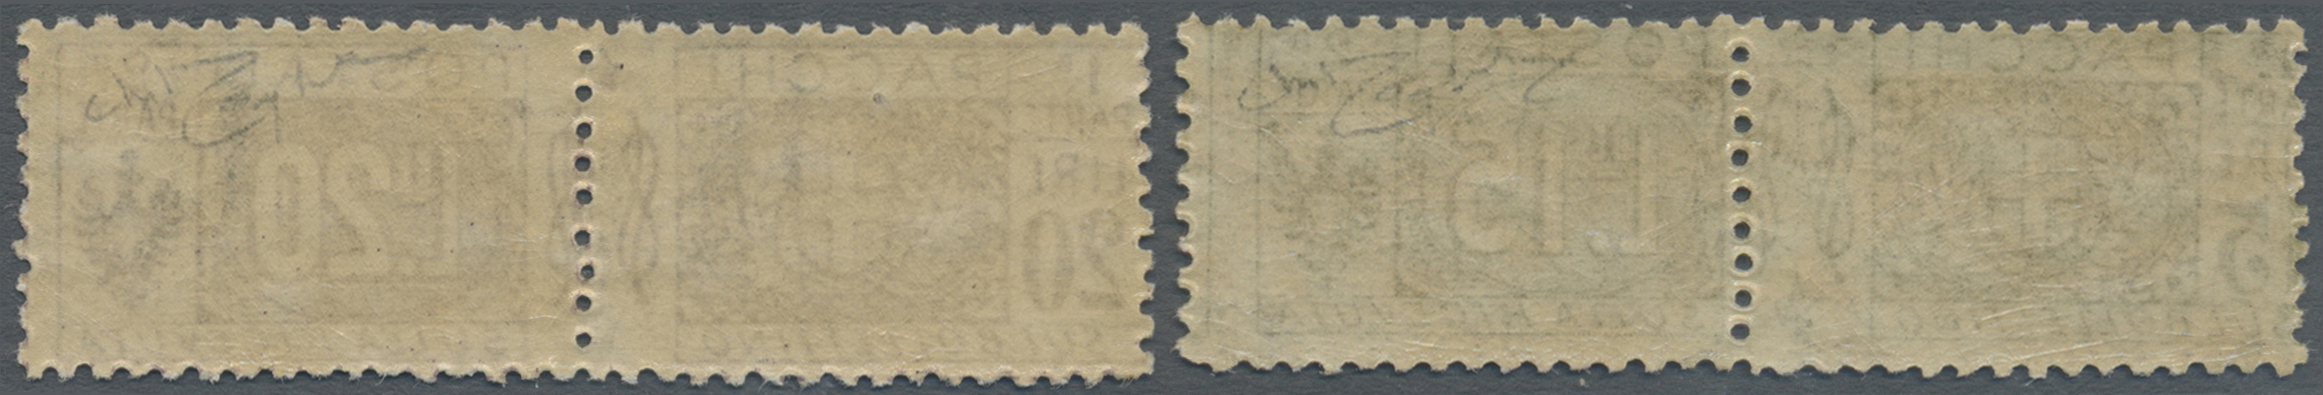 Lot 17098 - italien - paketmarken  -  Auktionshaus Christoph Gärtner GmbH & Co. KG Single lots Philately Overseas & Europe. Auction #39 Day 4